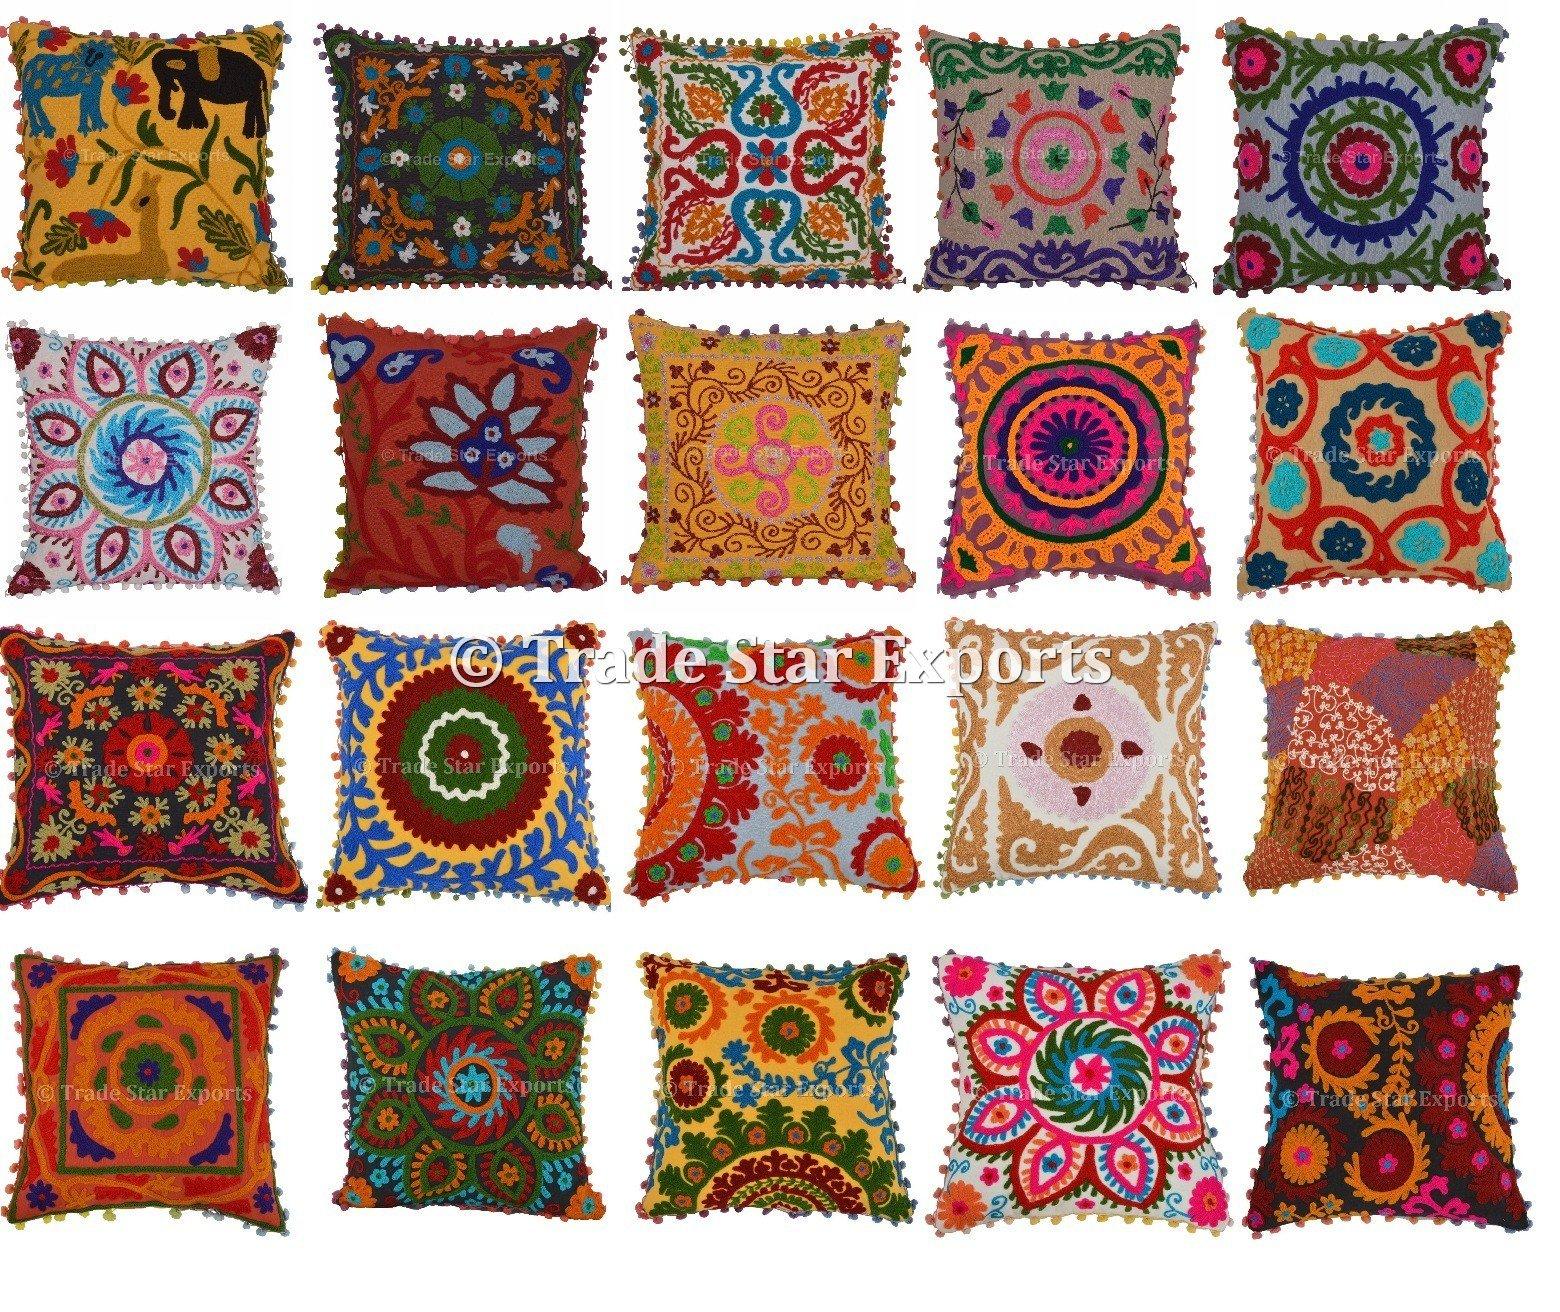 20 Pcs Indian Suzani Cushion, Bohemian Pillow Cases, 16x16 Throw Pillows, Pom Pom Cushion Cover, Decorative Embroidered Pillow Shams (20)